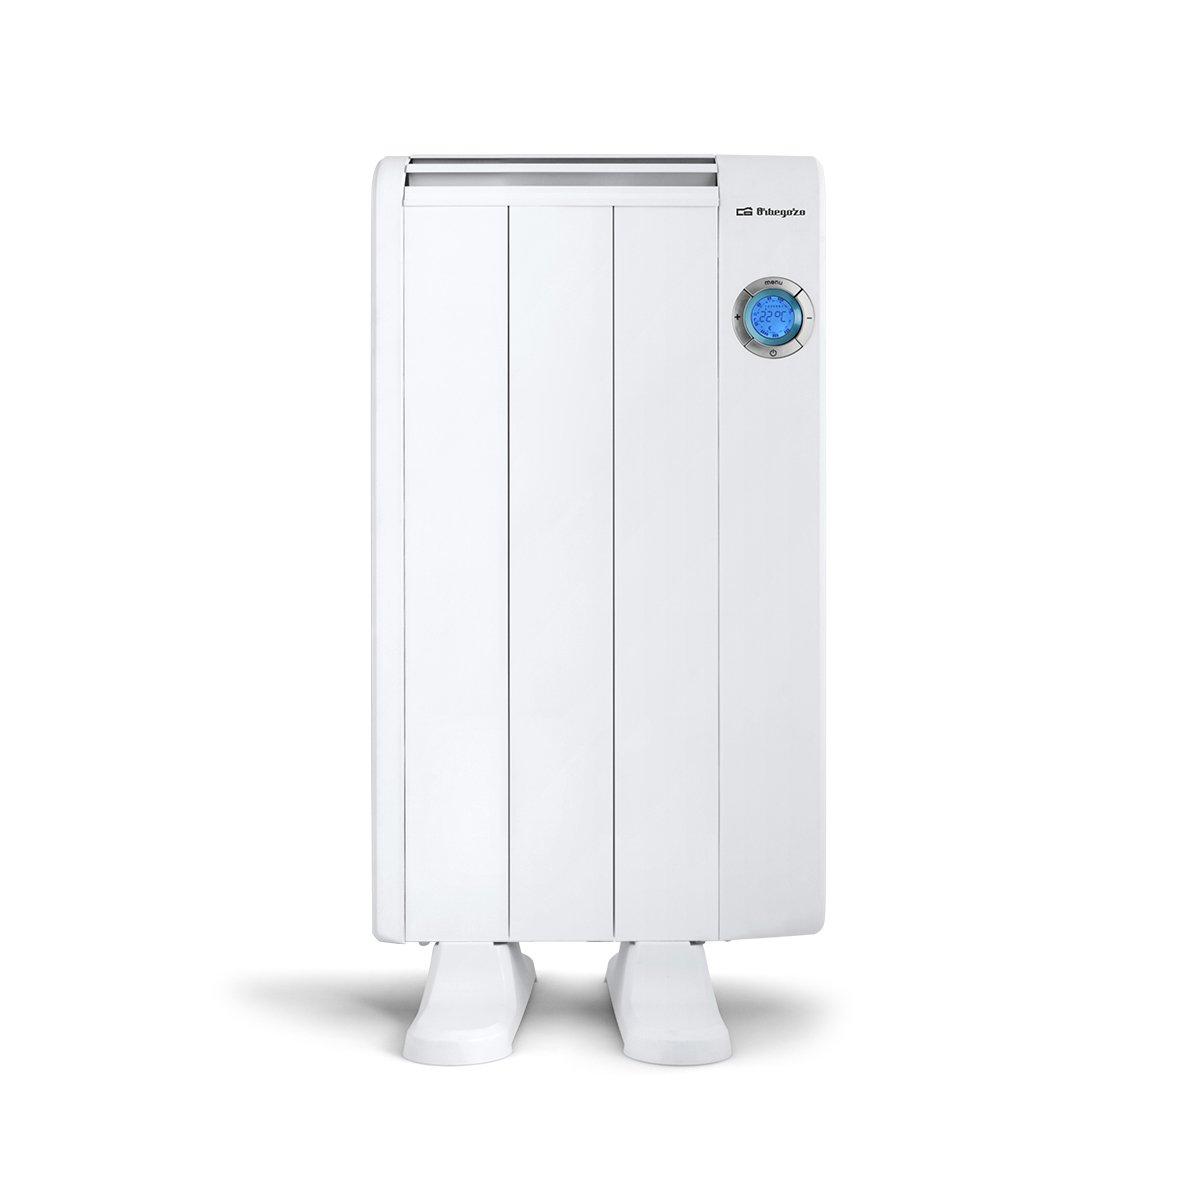 Orbegozo RRE 510 Emisor térmico, 500 W, Aluminio, Color blanco